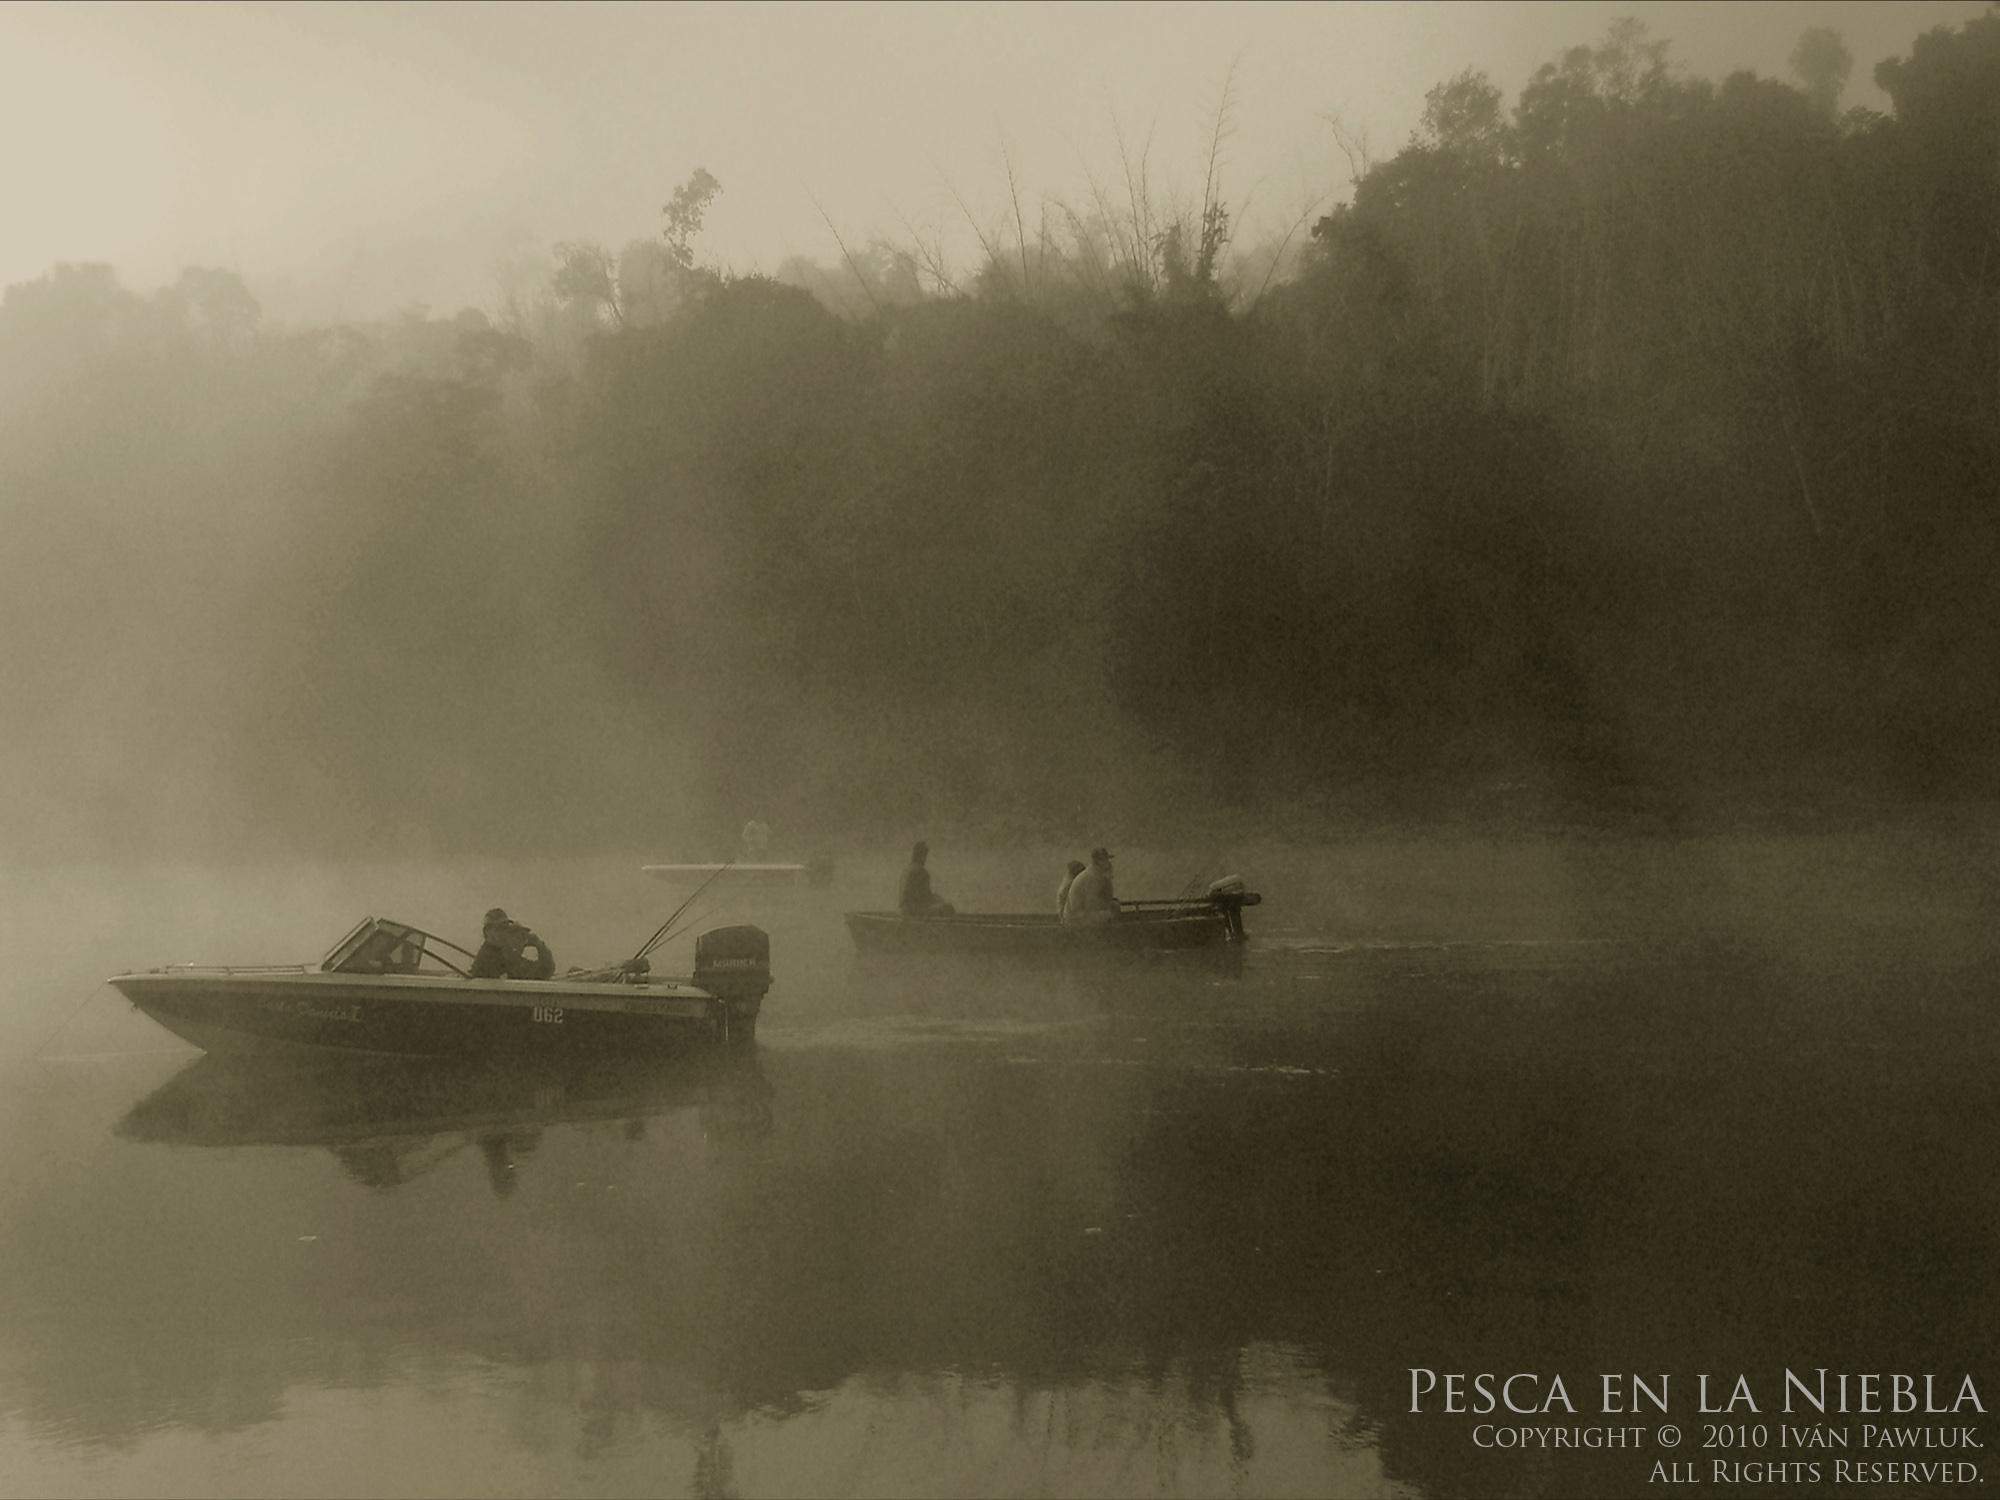 Pesca en la niebla  Autor: Ivan Pawluk